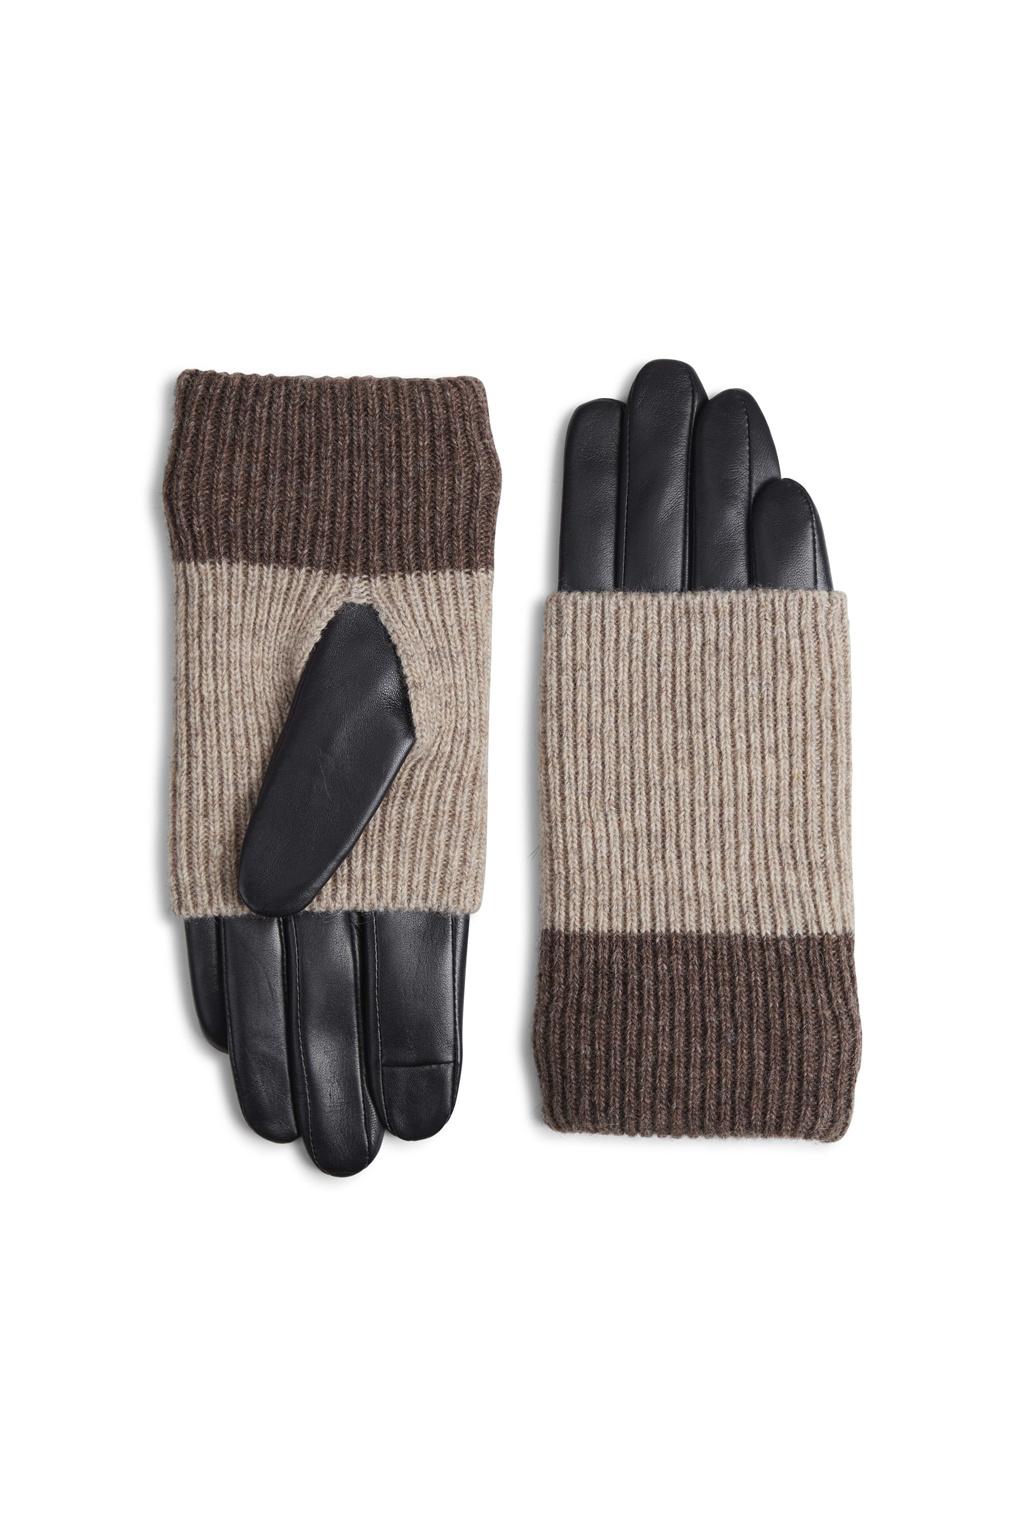 Helly Glove - Black w/ Creme + Hazel-2